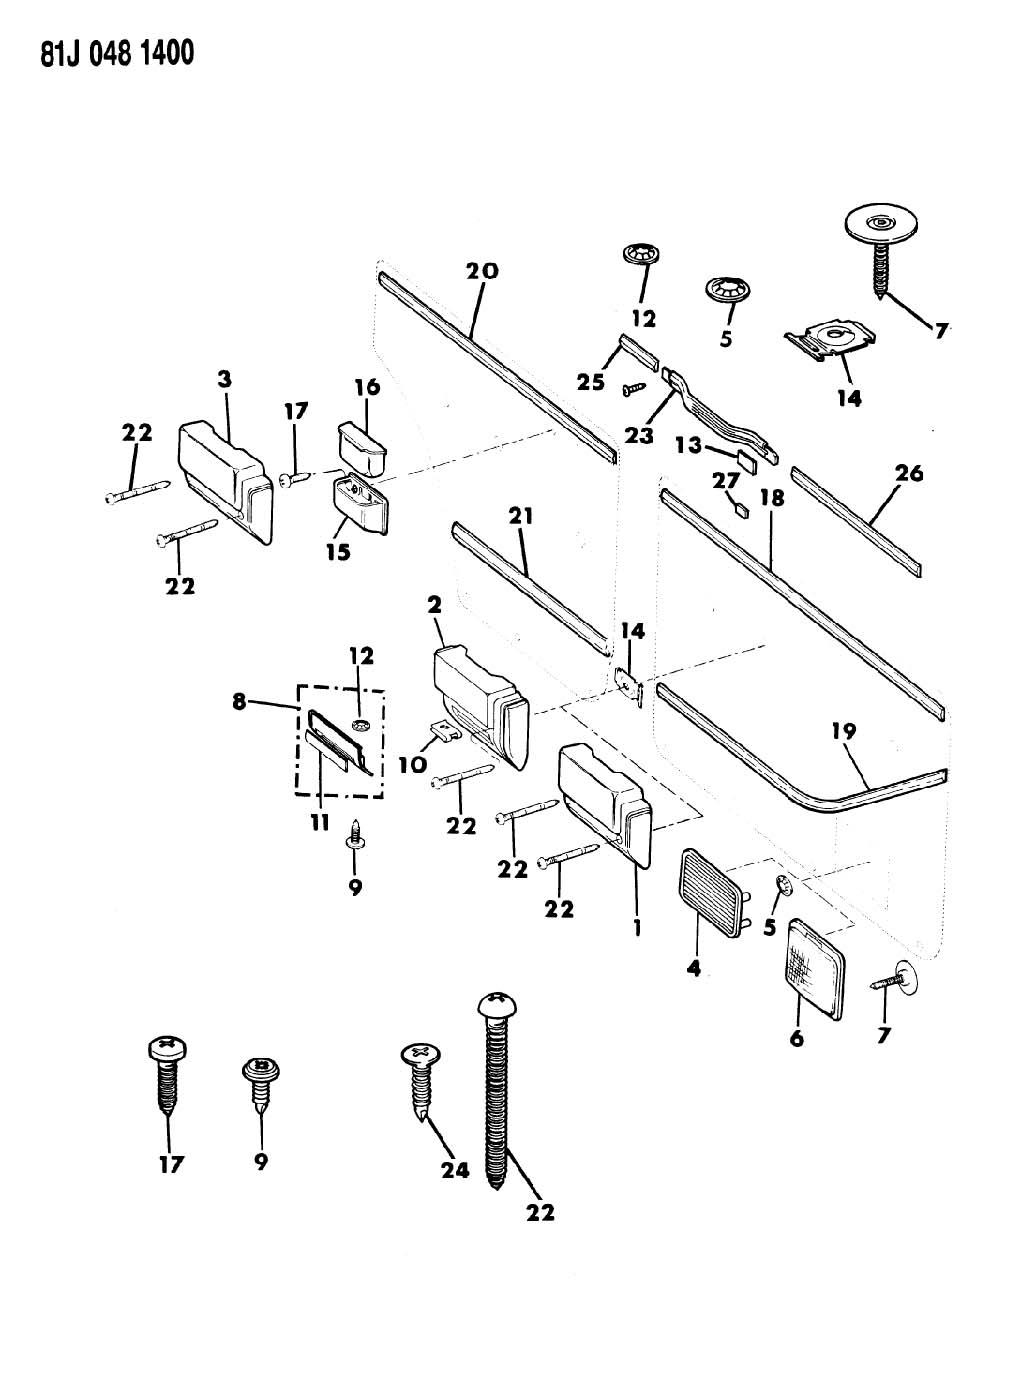 76 Gmc Jimmy Wiring Diagrams. Gmc. Auto Wiring Diagram